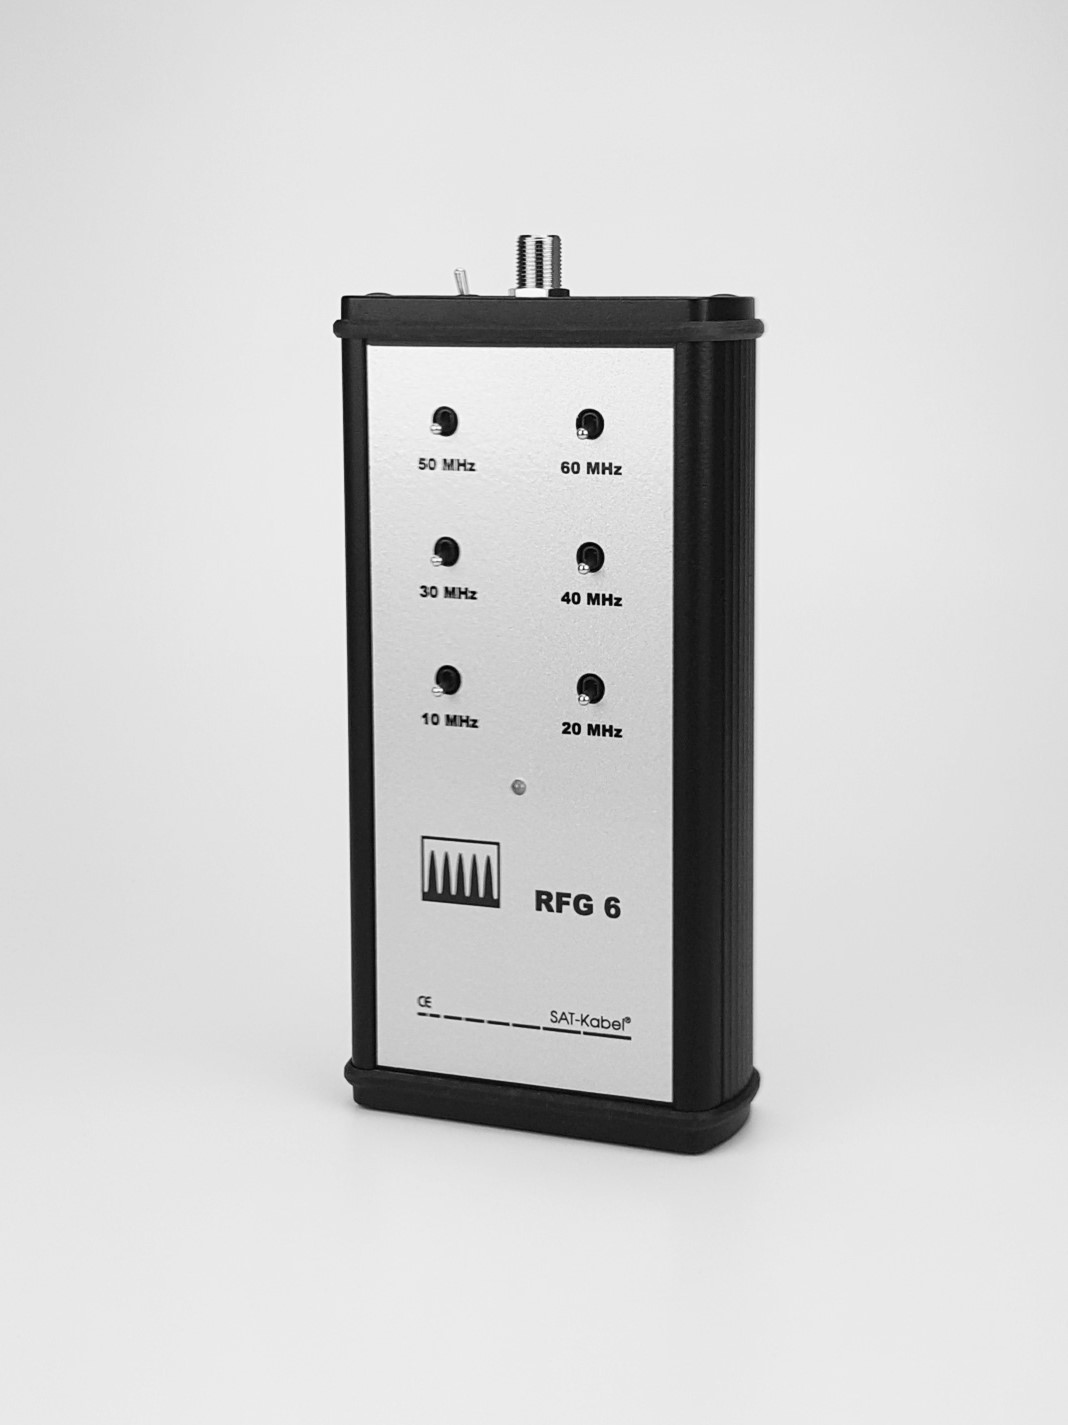 RFG 6 - Rückkanalfestfrequenzgenerator